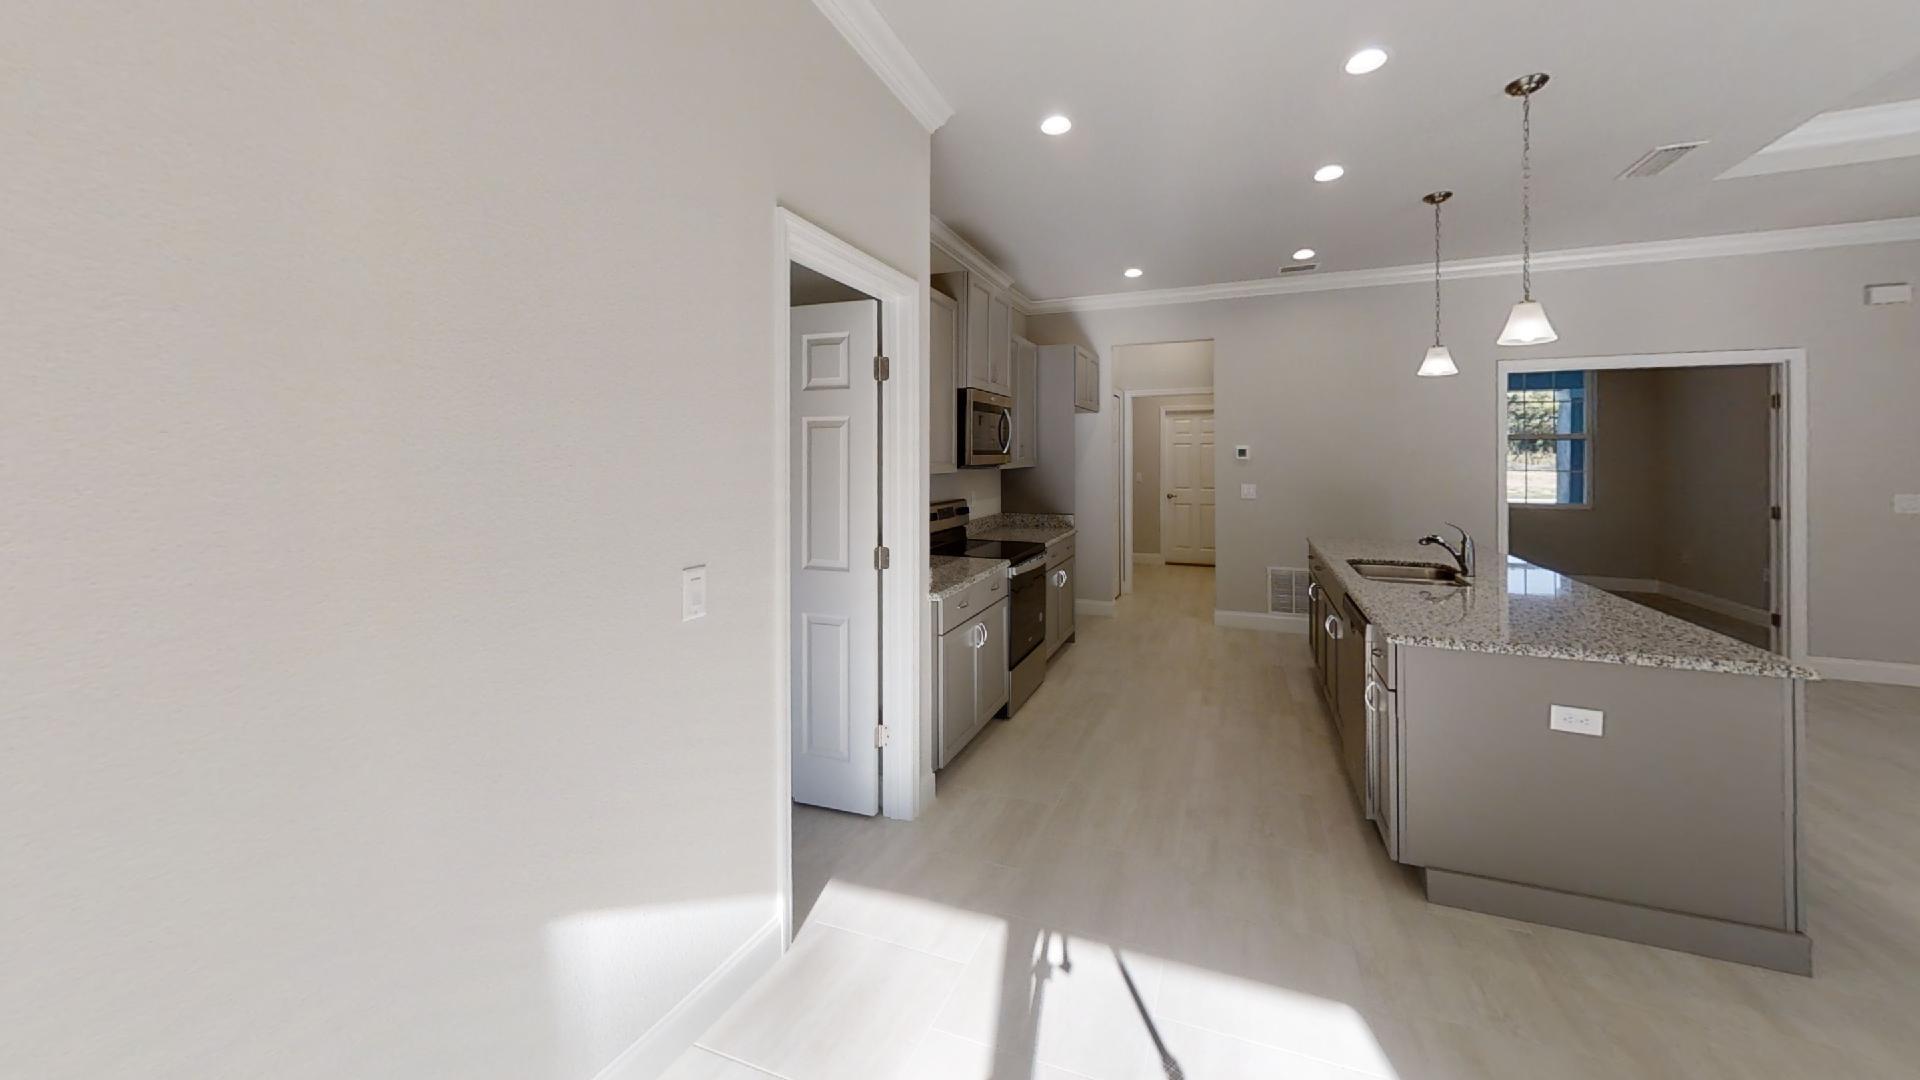 Kitchen featured in The Audubon By Vanacore Homes in Daytona Beach, FL